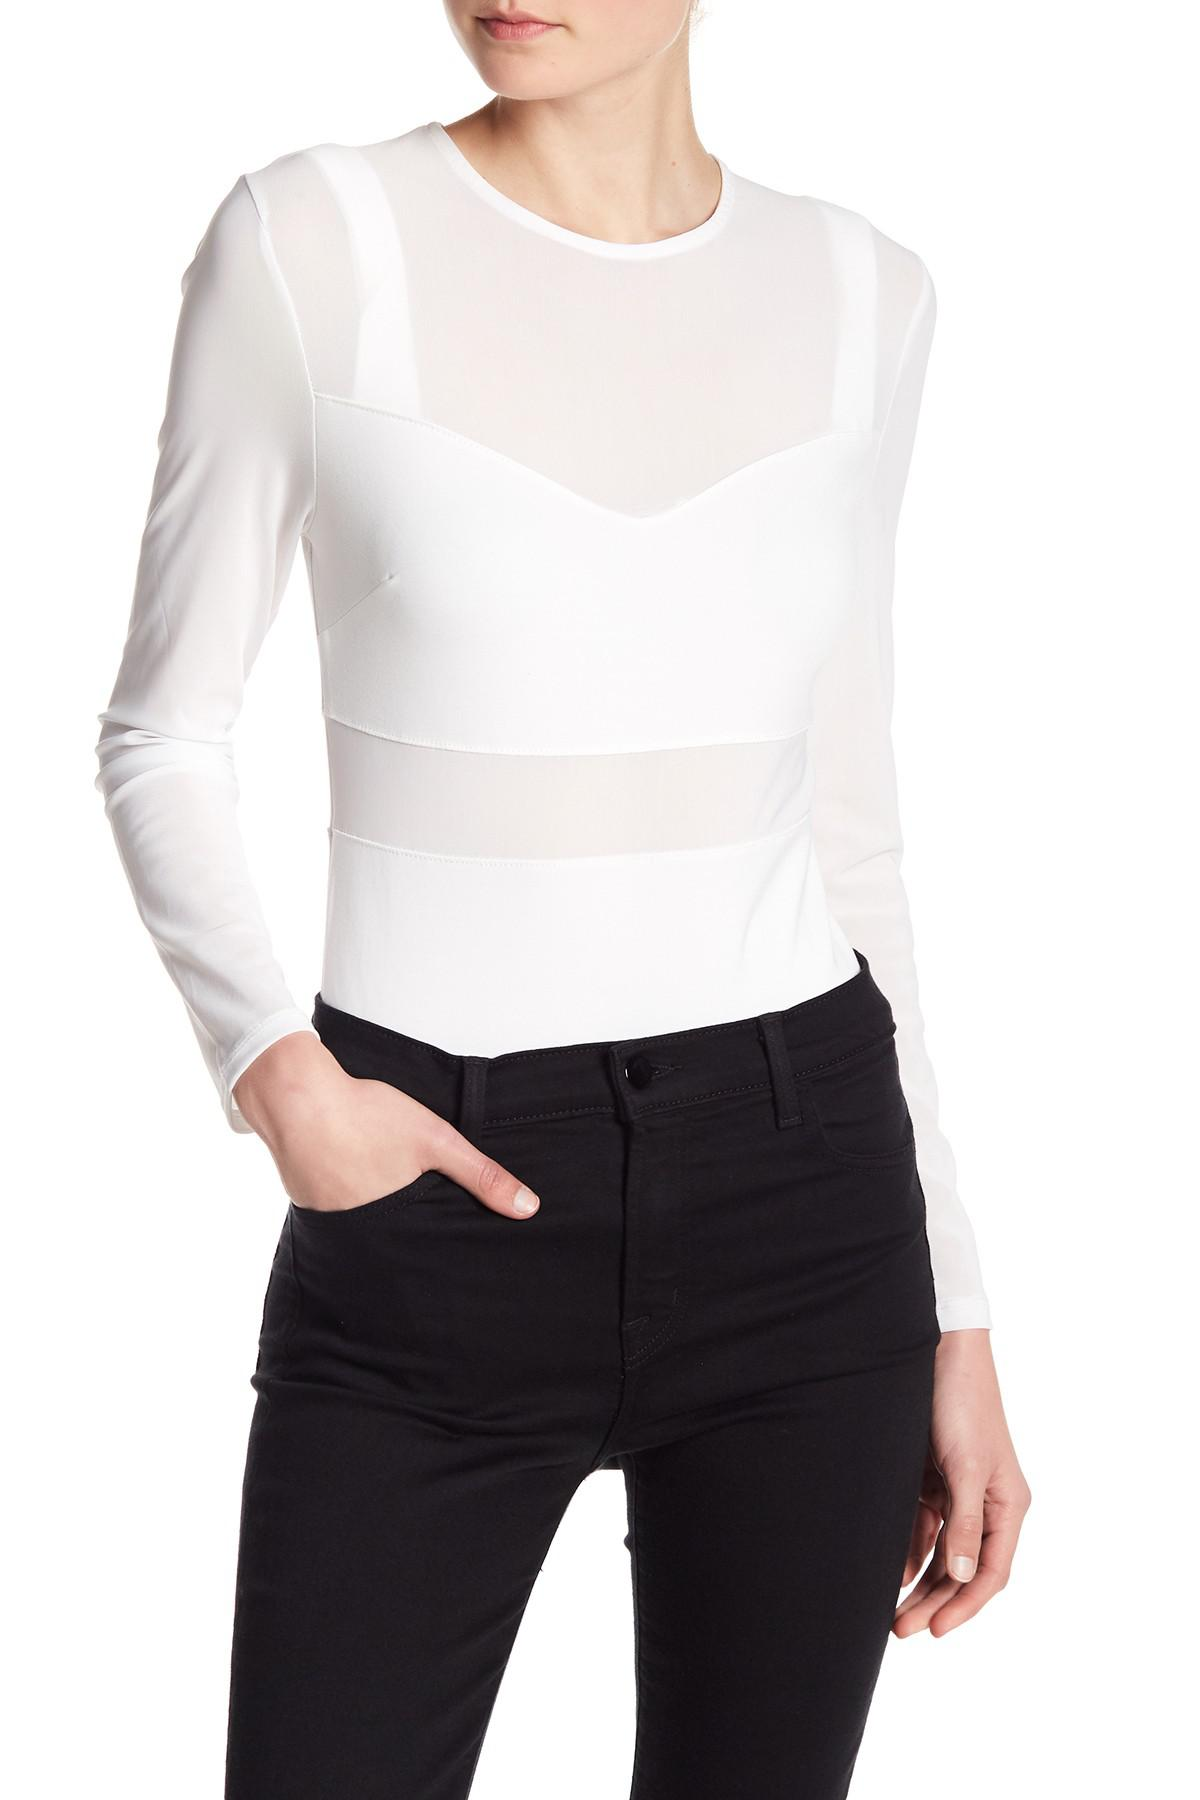 e01bc30520a Lyst - Kendall + Kylie Bralette Mesh Bodysuit in White